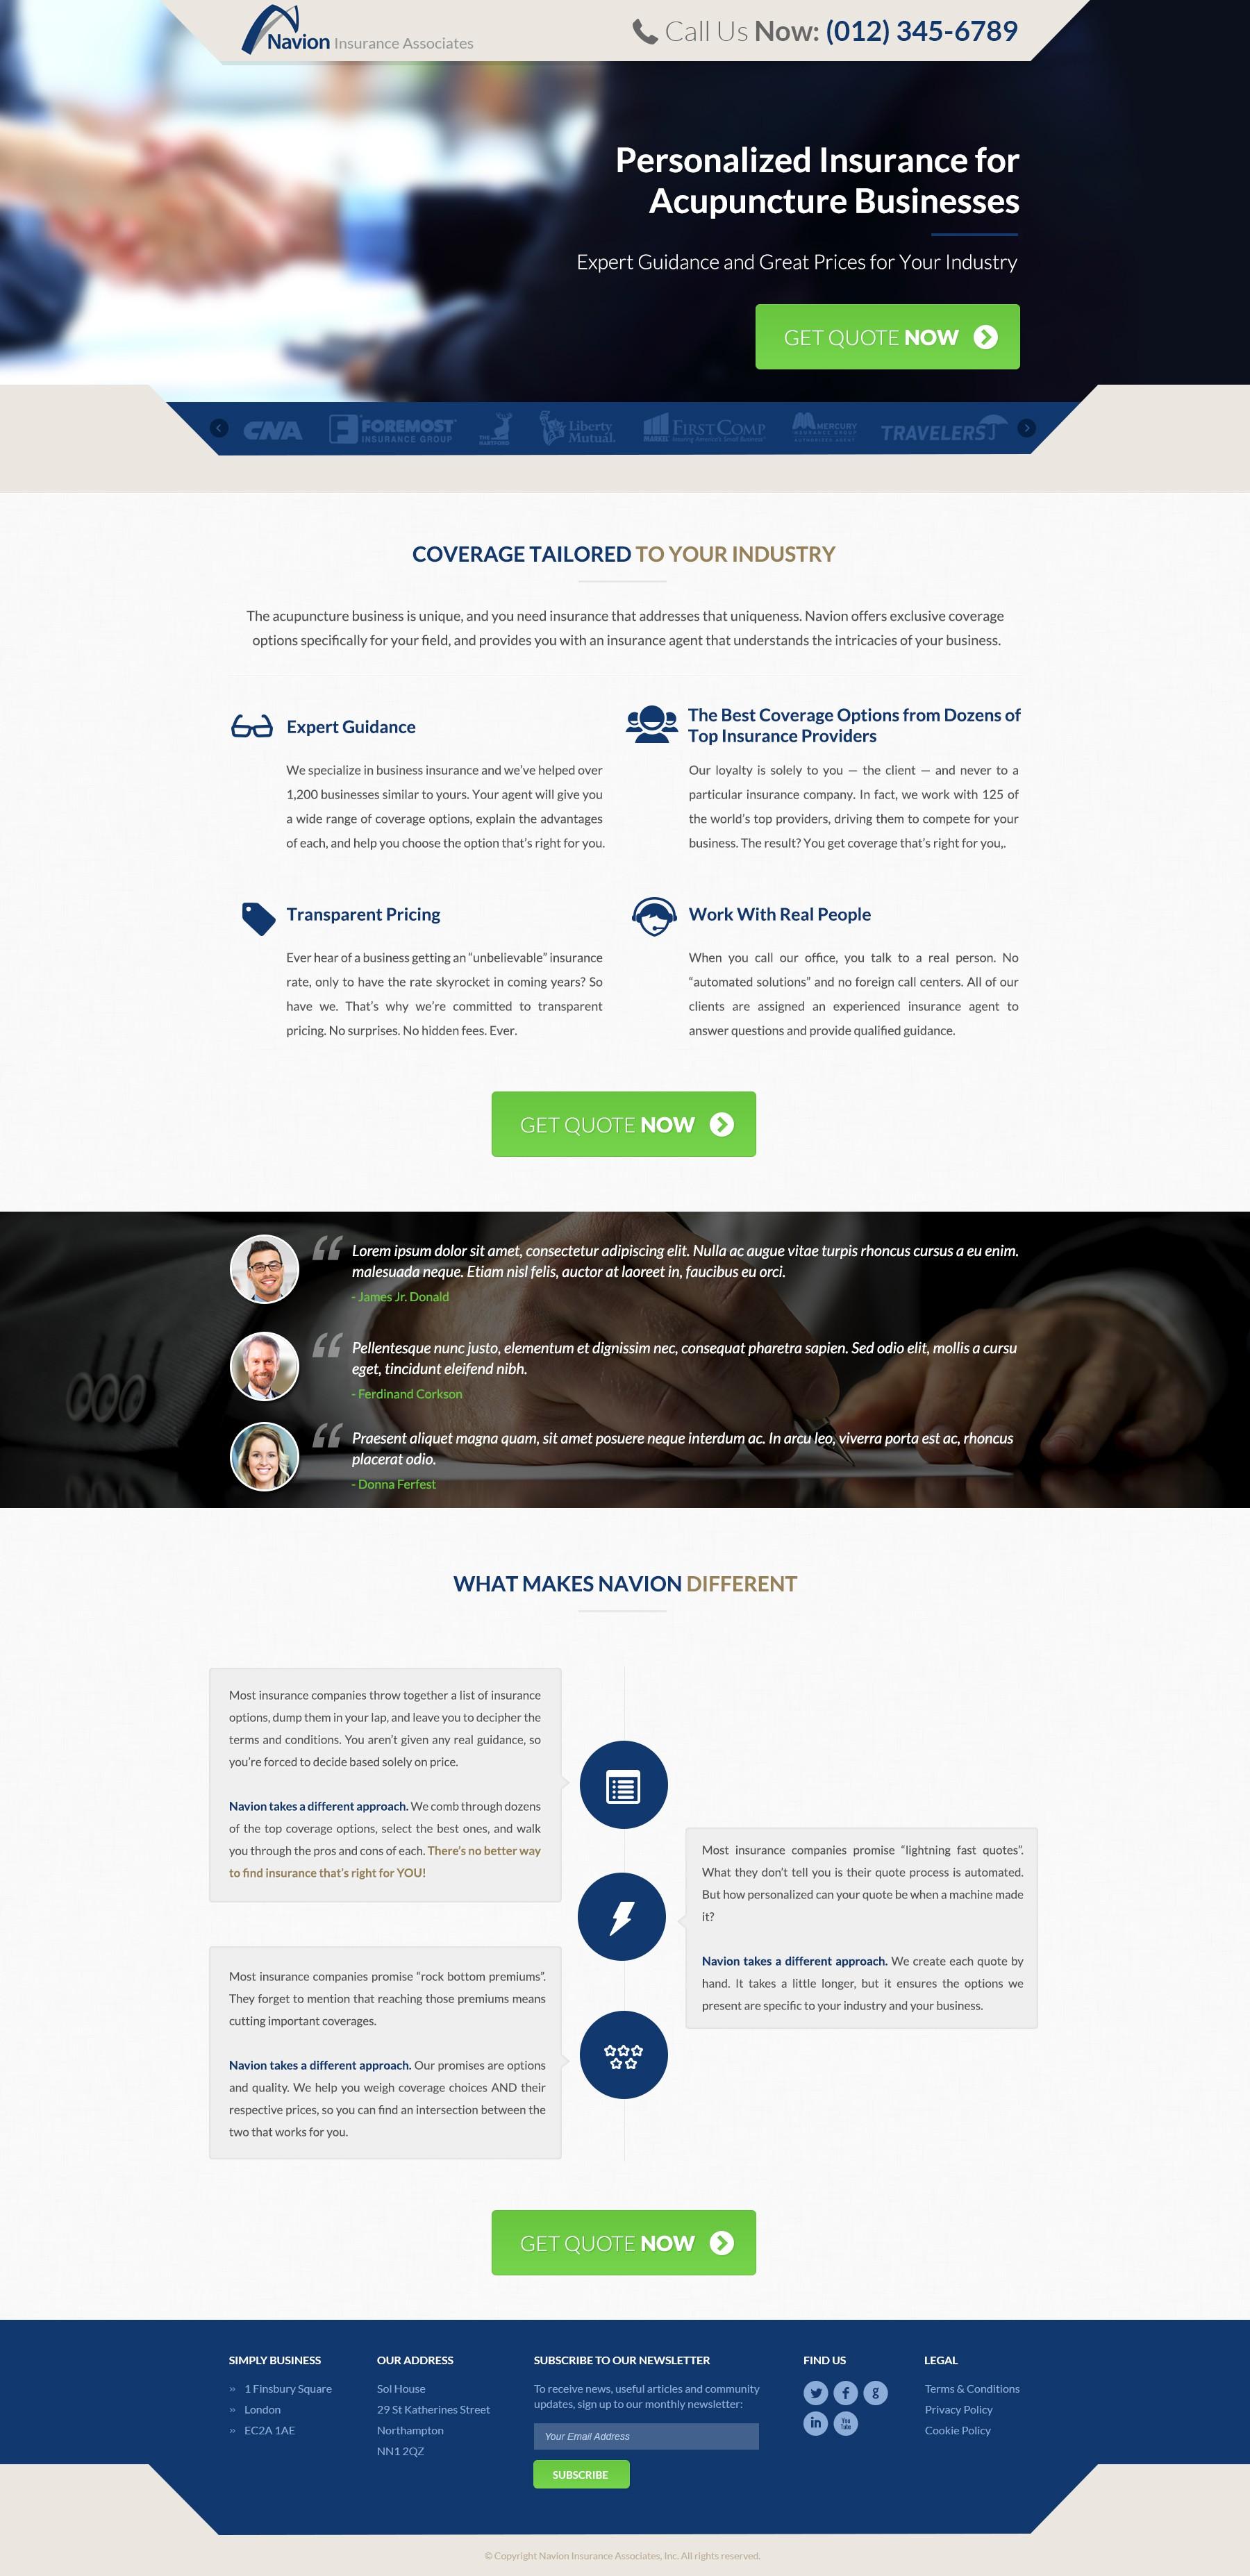 Create a CTA Landing Page for Navion Insurance Associates